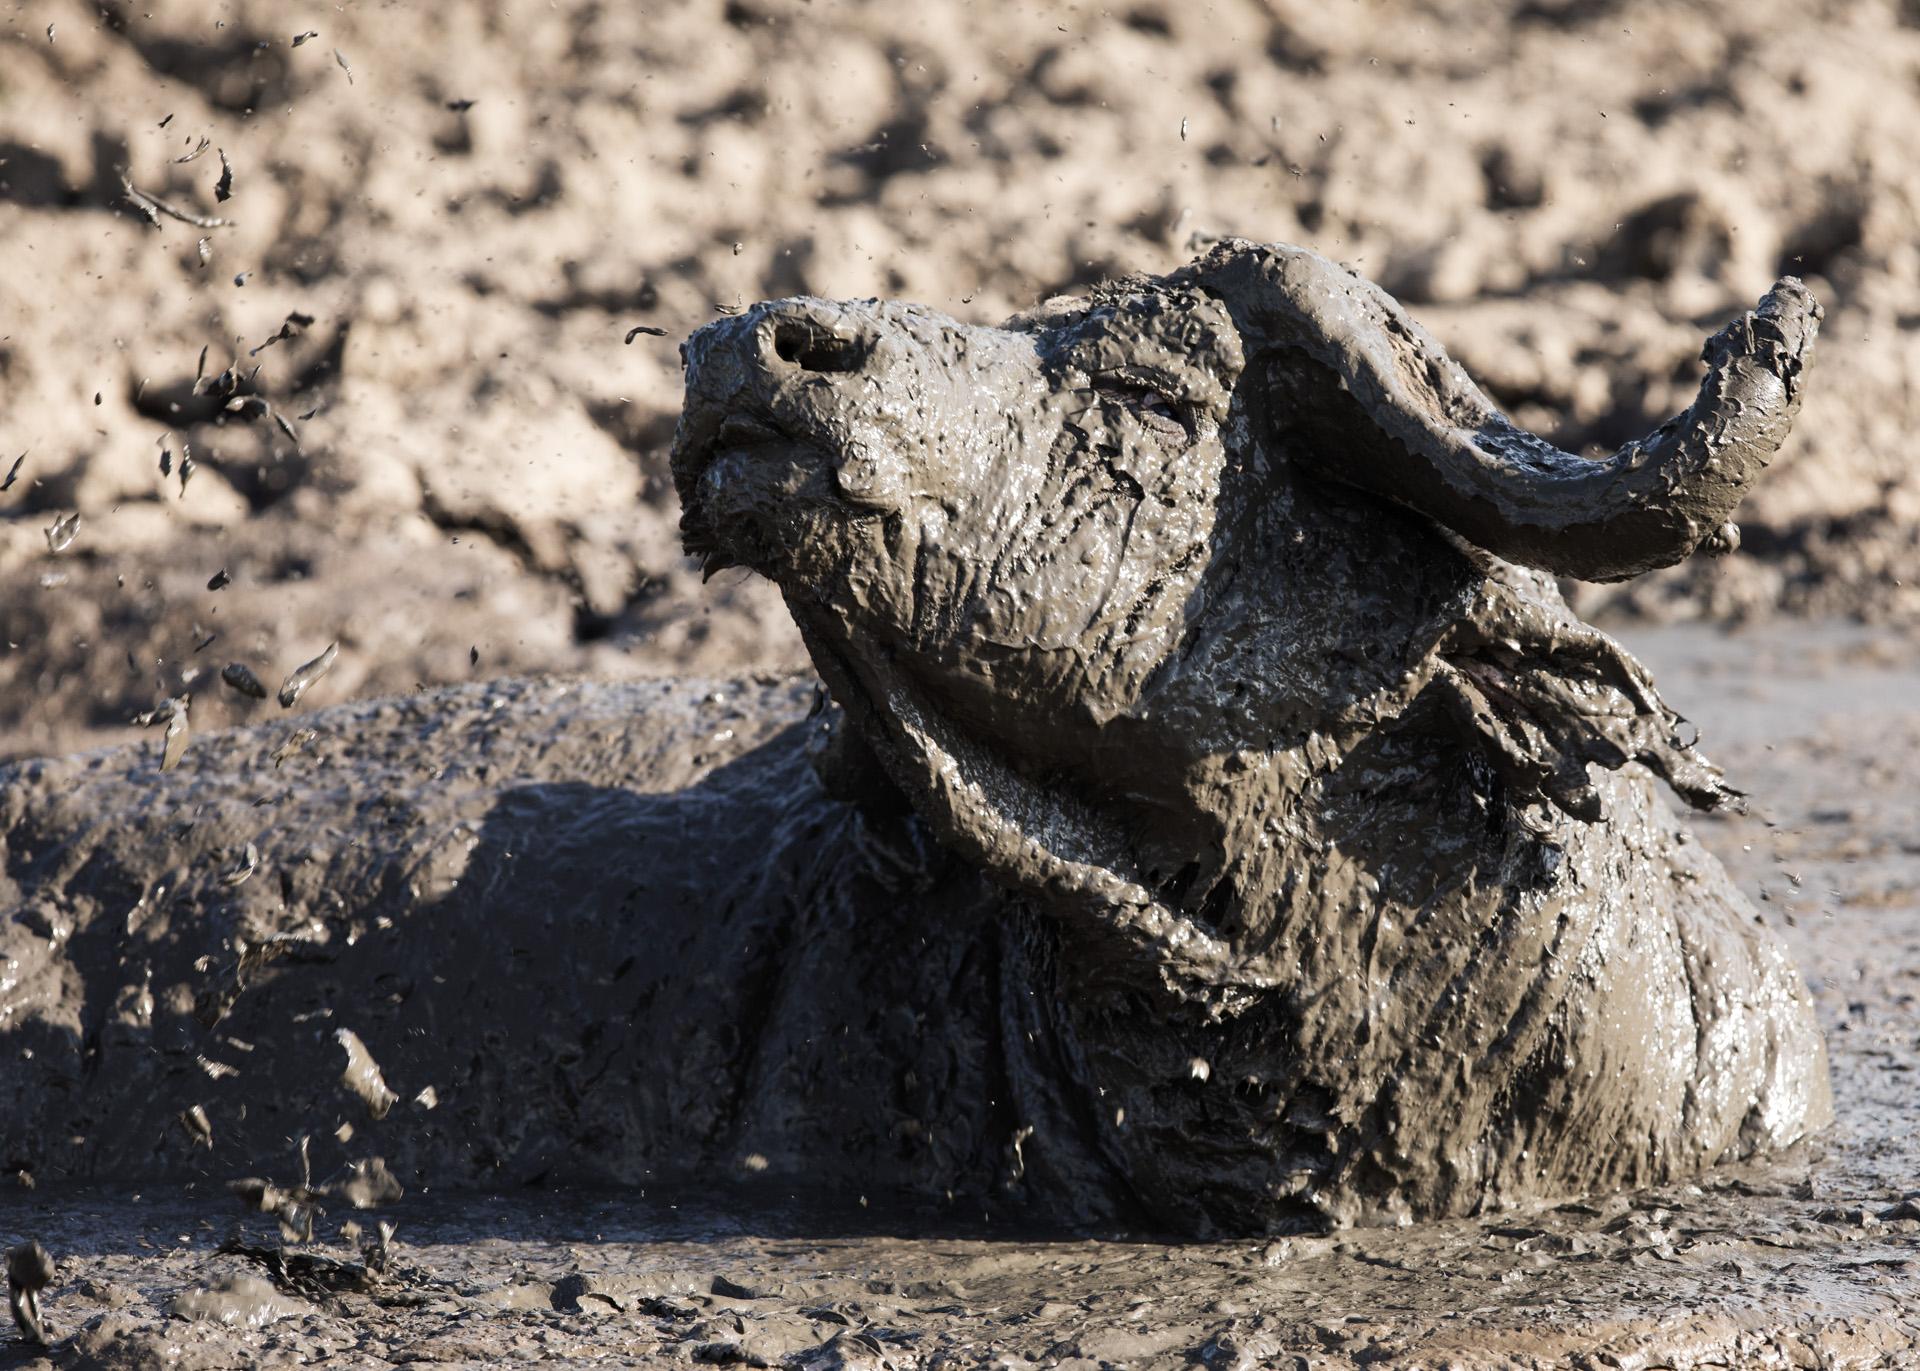 Buffalo in mud